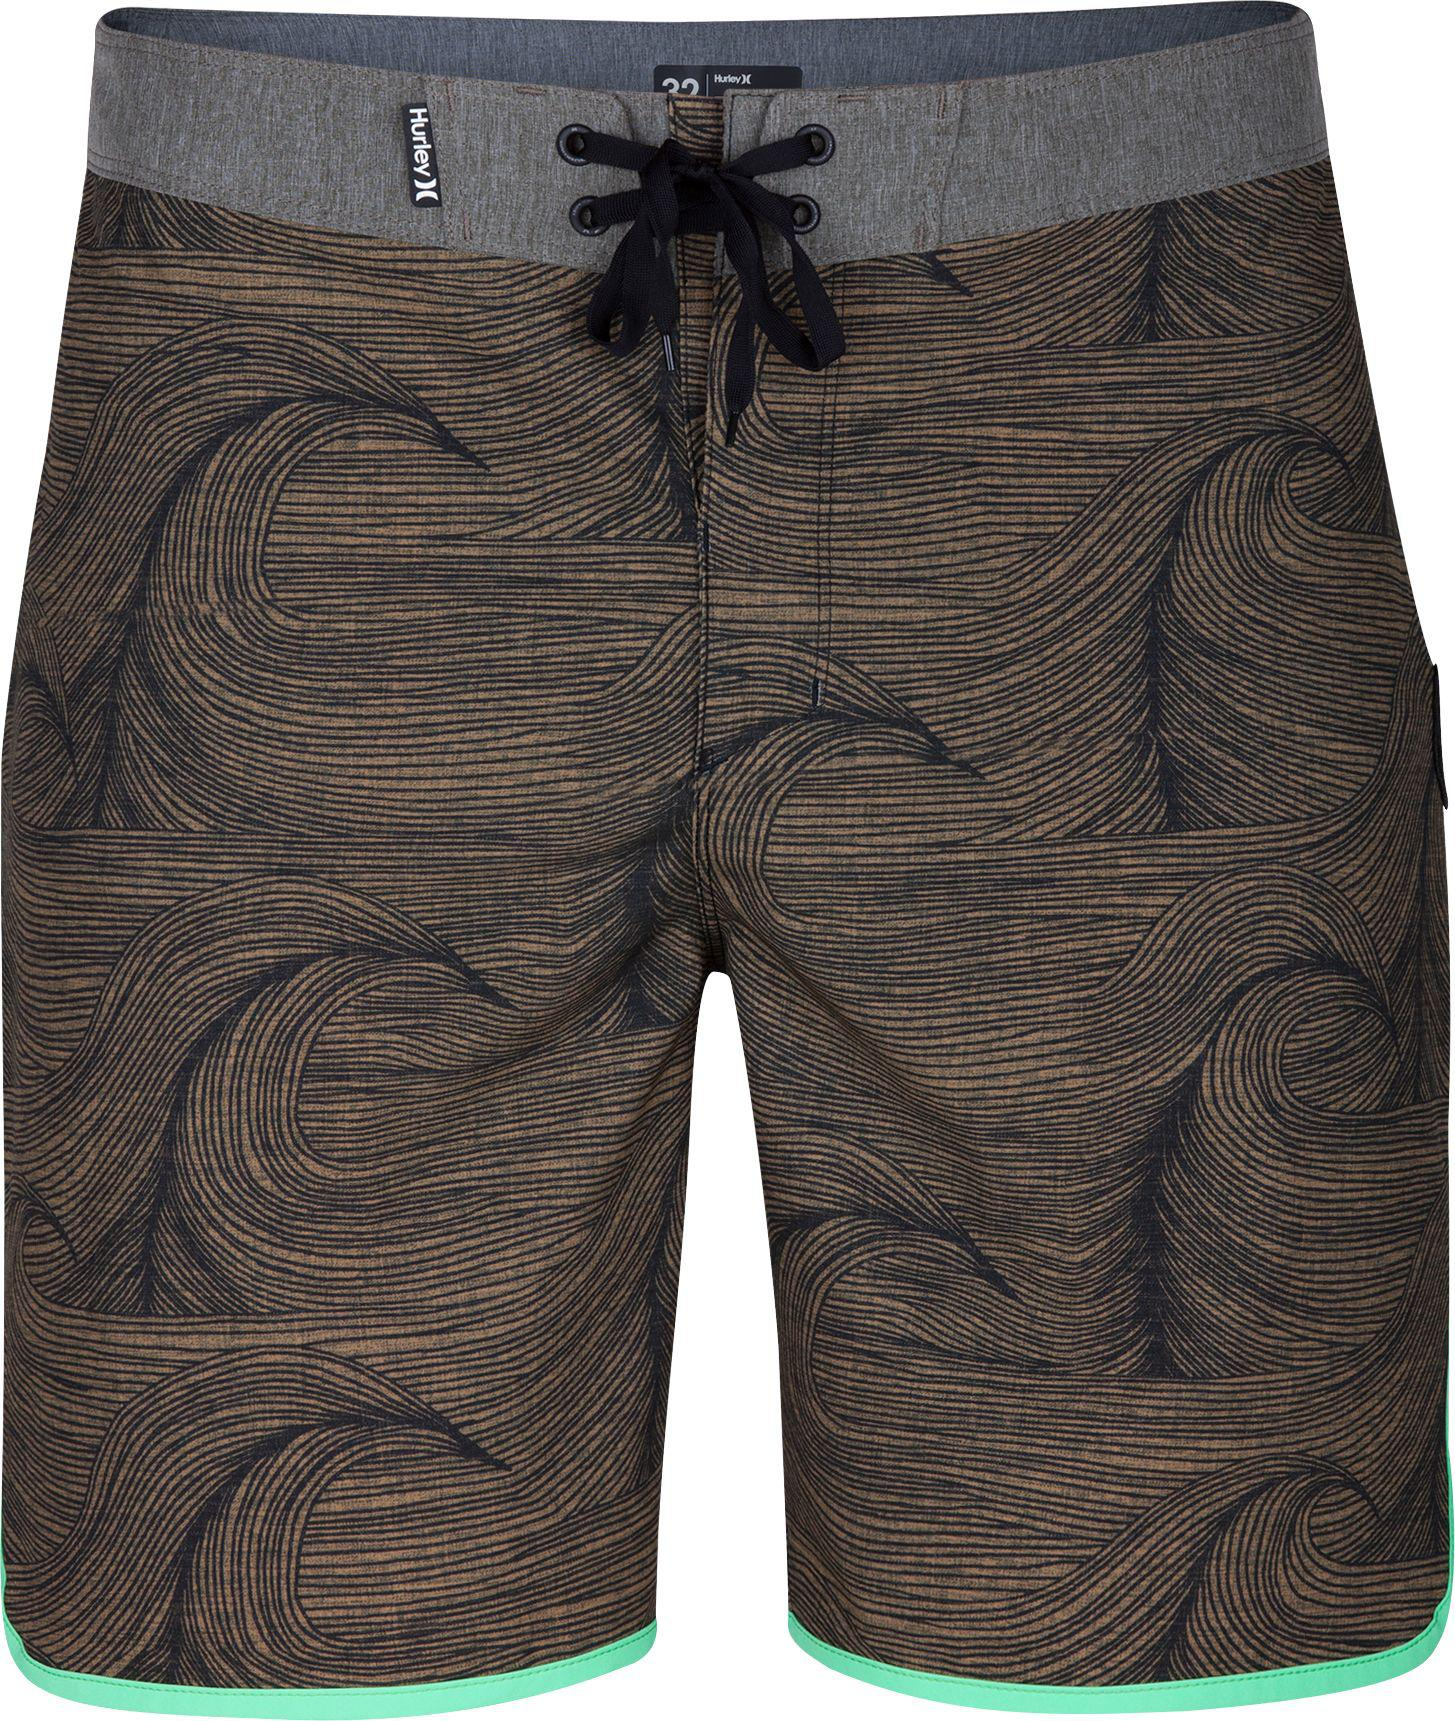 5194050a93 Hurley Phantom Brooks Board Shorts for Men - Lyst